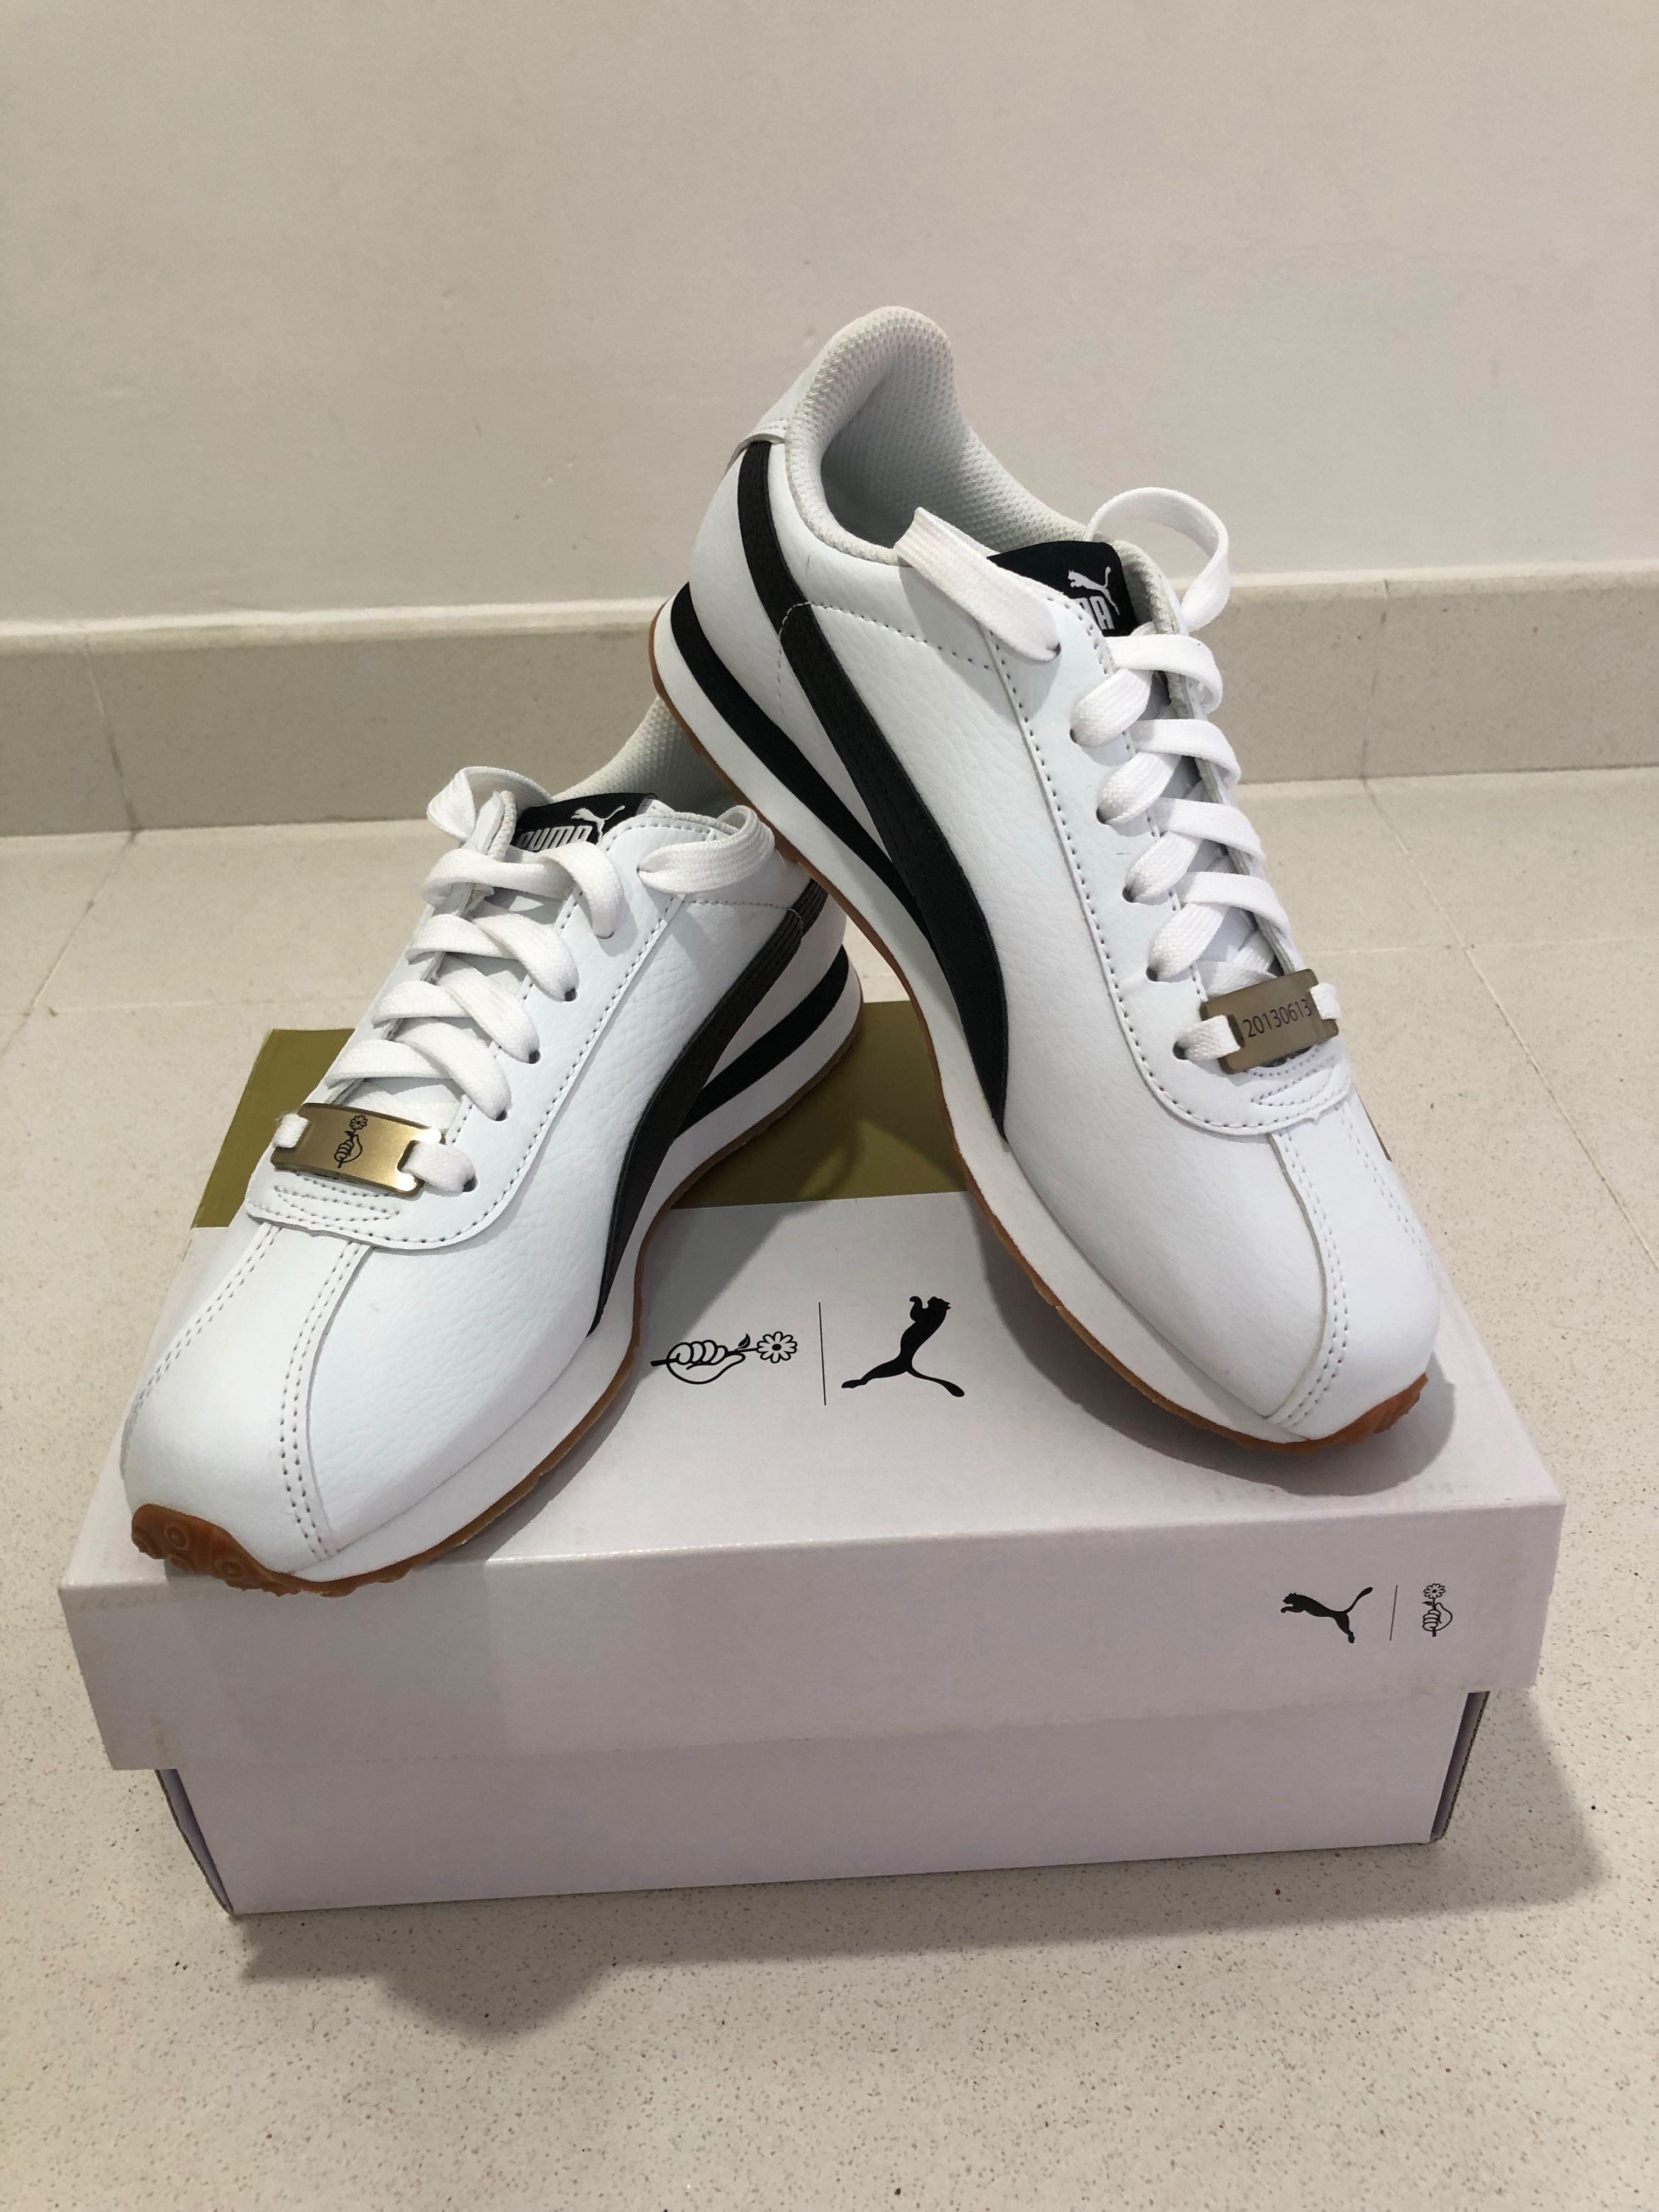 26bf89c0731  WTS  BTS Puma Turin shoes